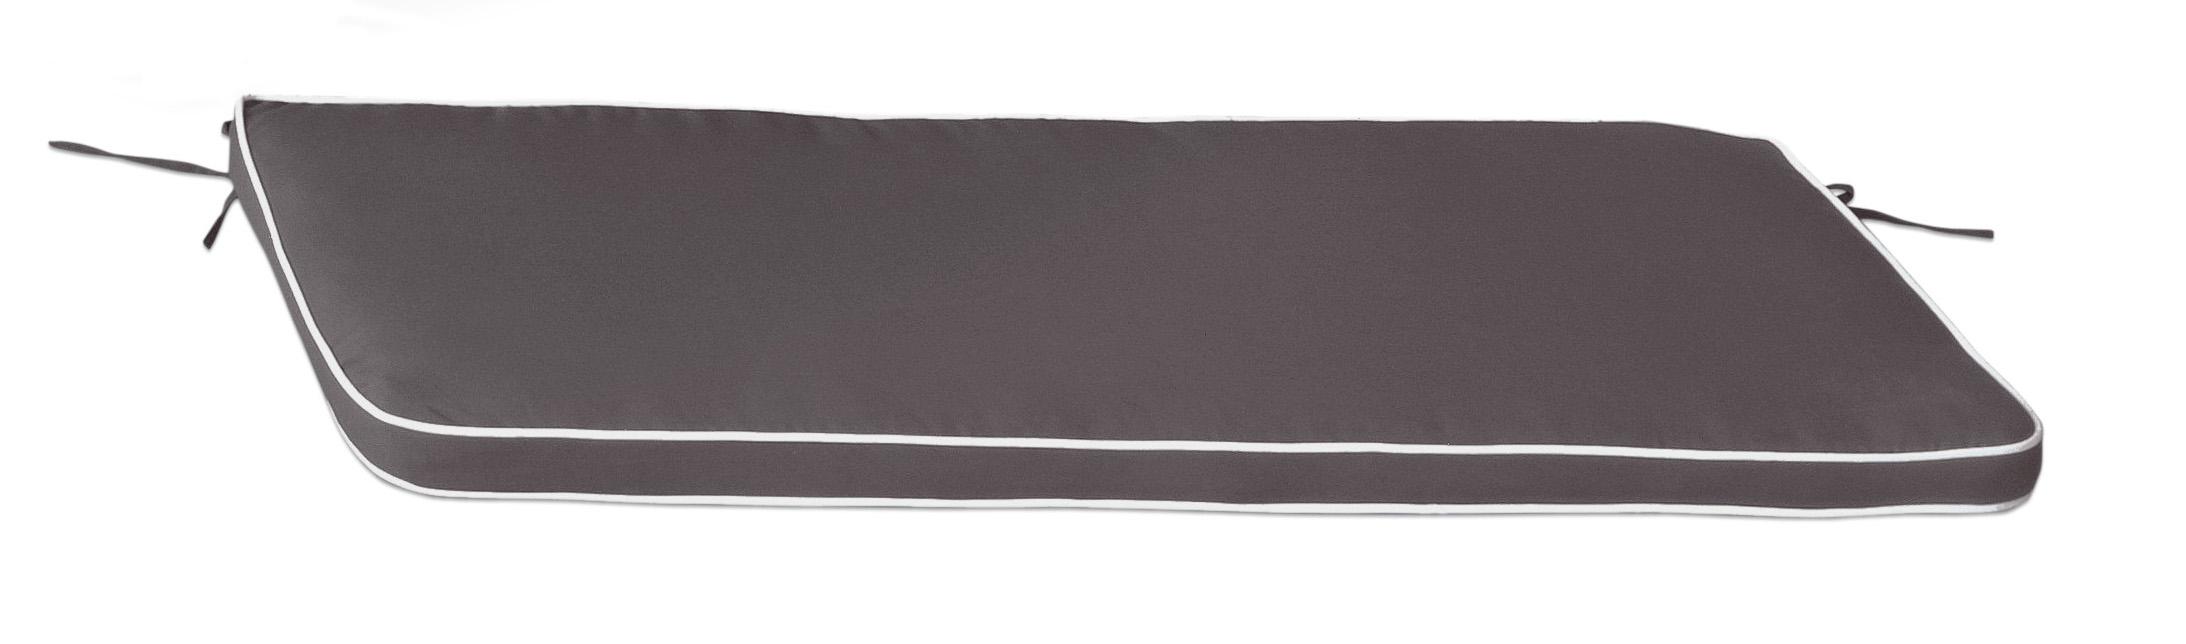 Cuscino per panca con doppia cucitura GRIGIO